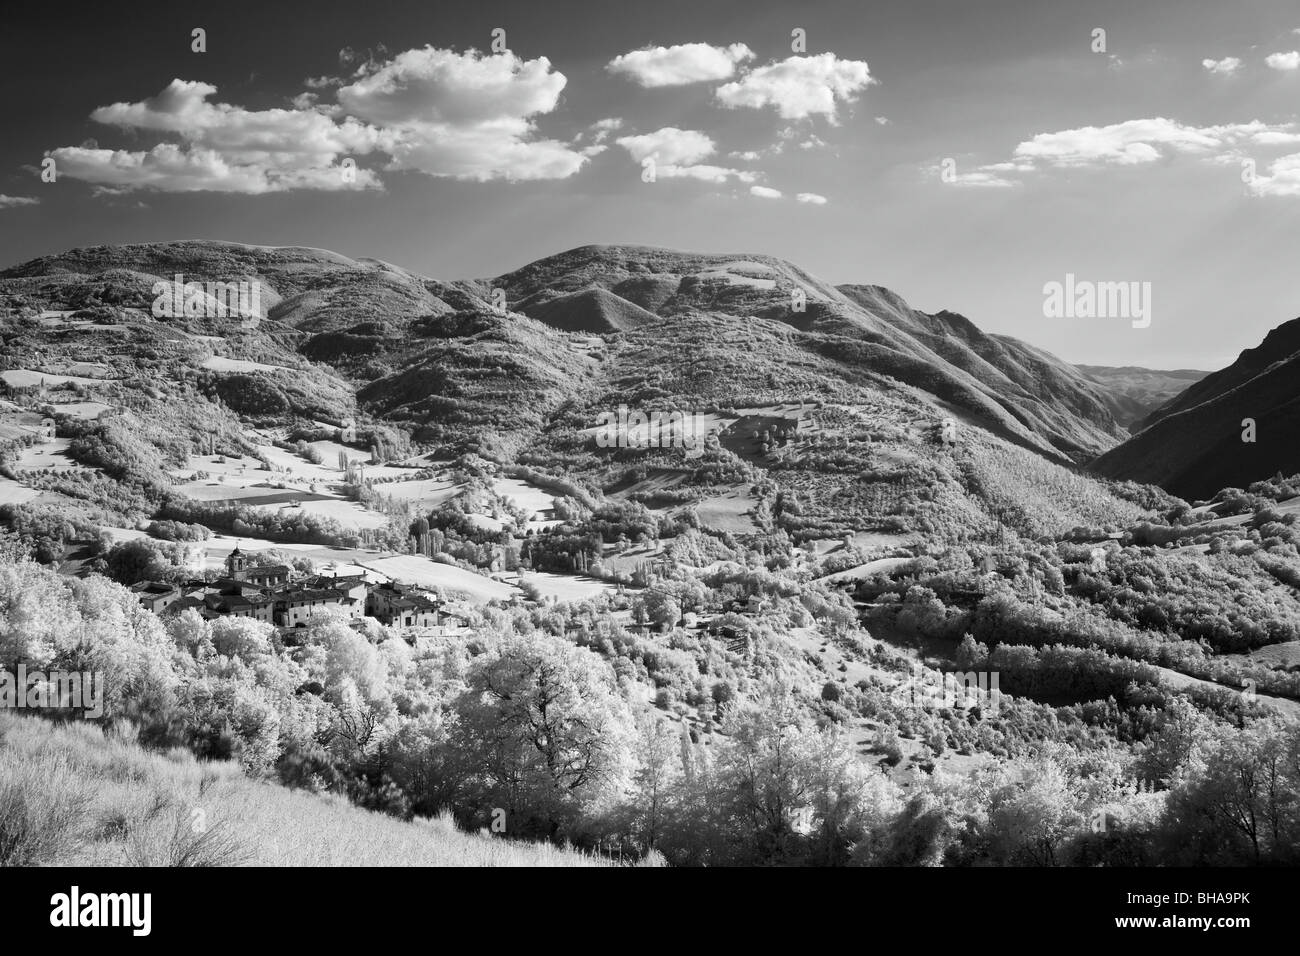 the Valnerina and village of Castelvechio nr Preci, Umbria, Italy - Stock Image